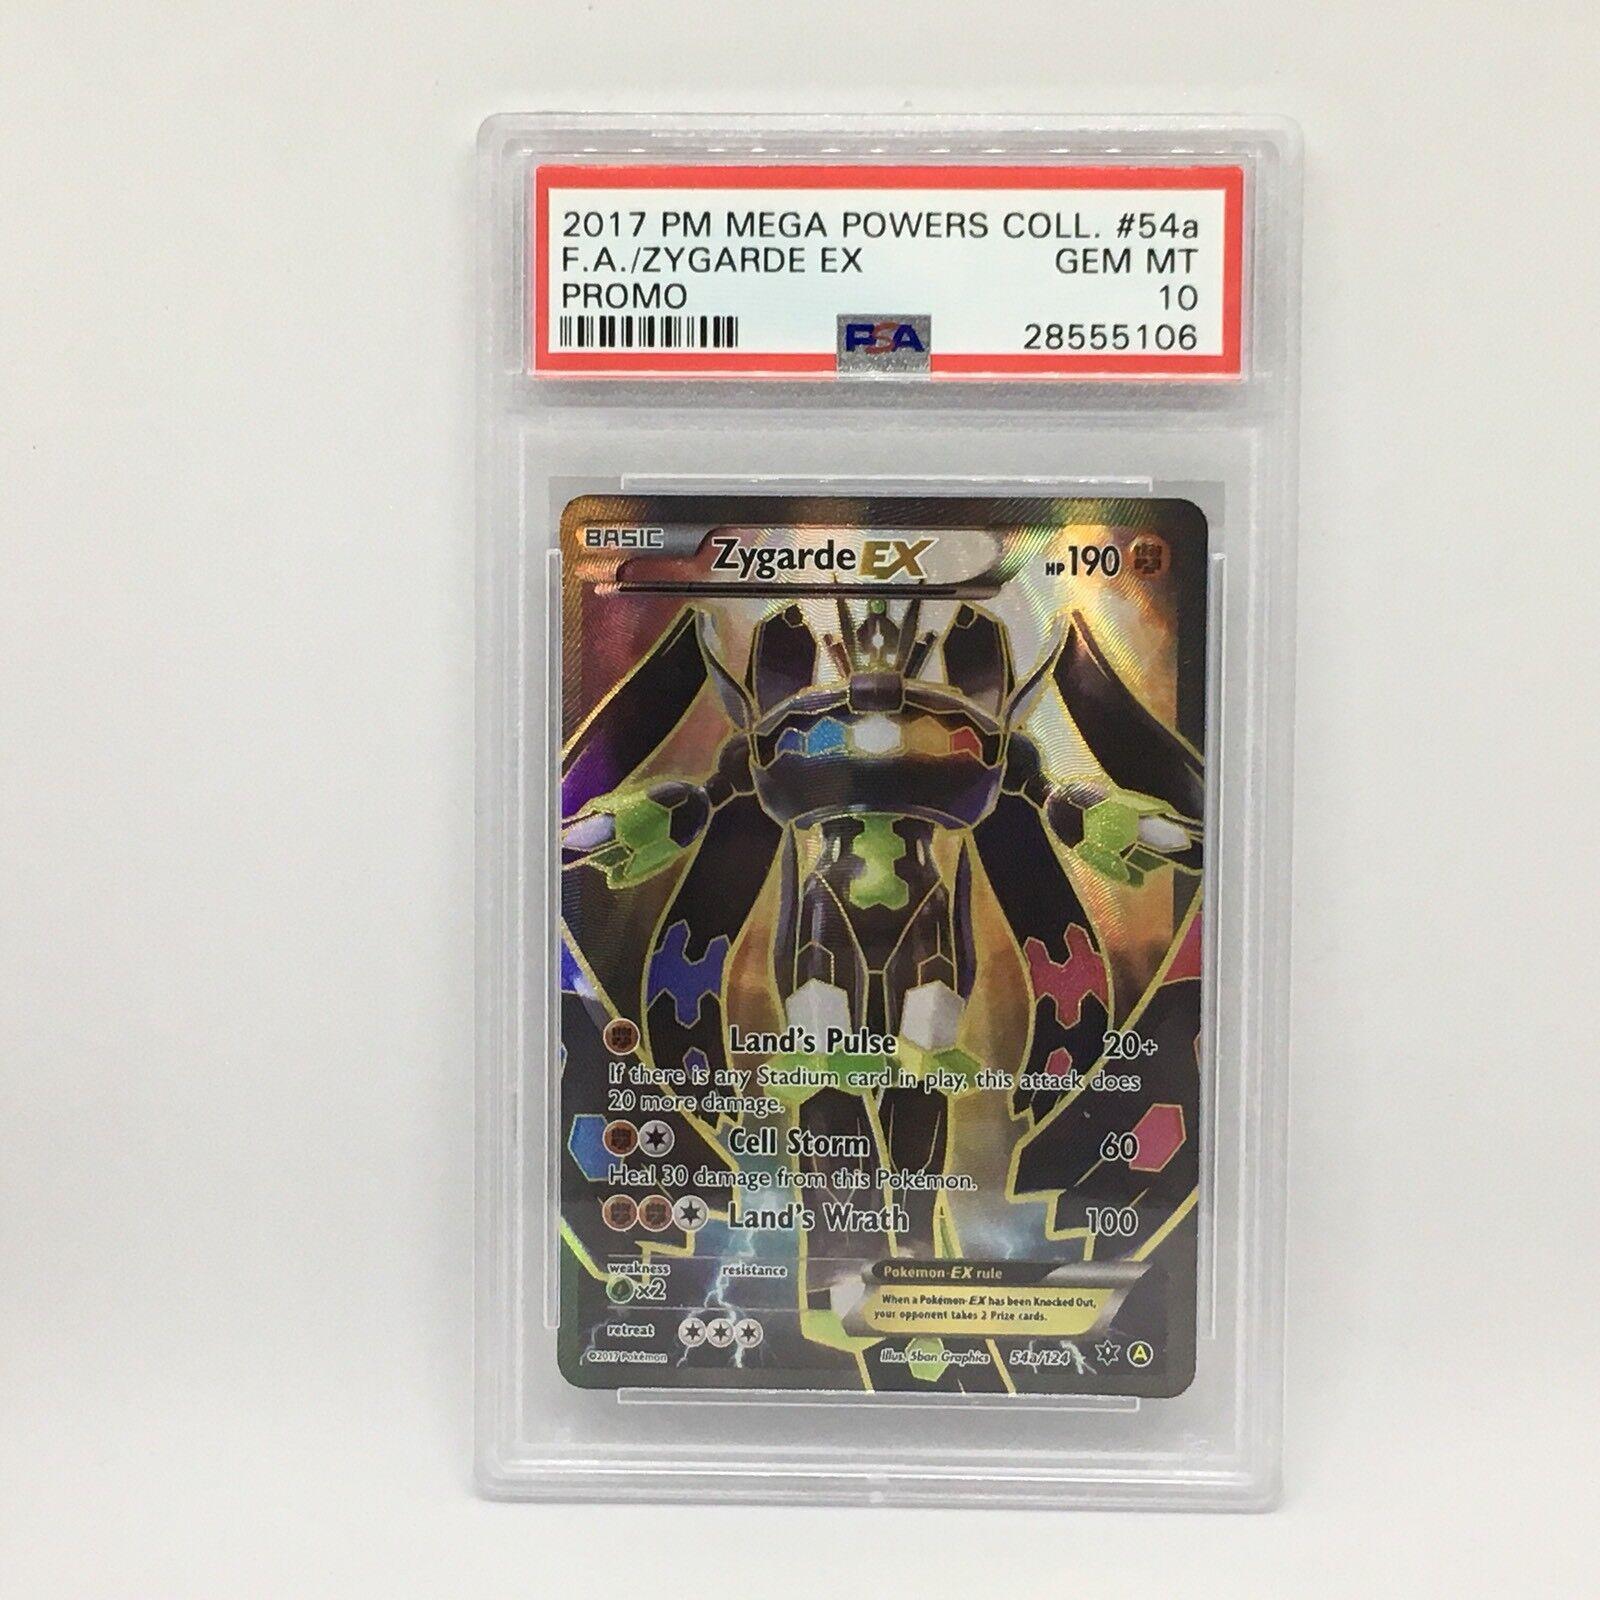 Psa - 10 zygarde ex voller kunst   54a pokémon - mega - kräfte sammeln promo card